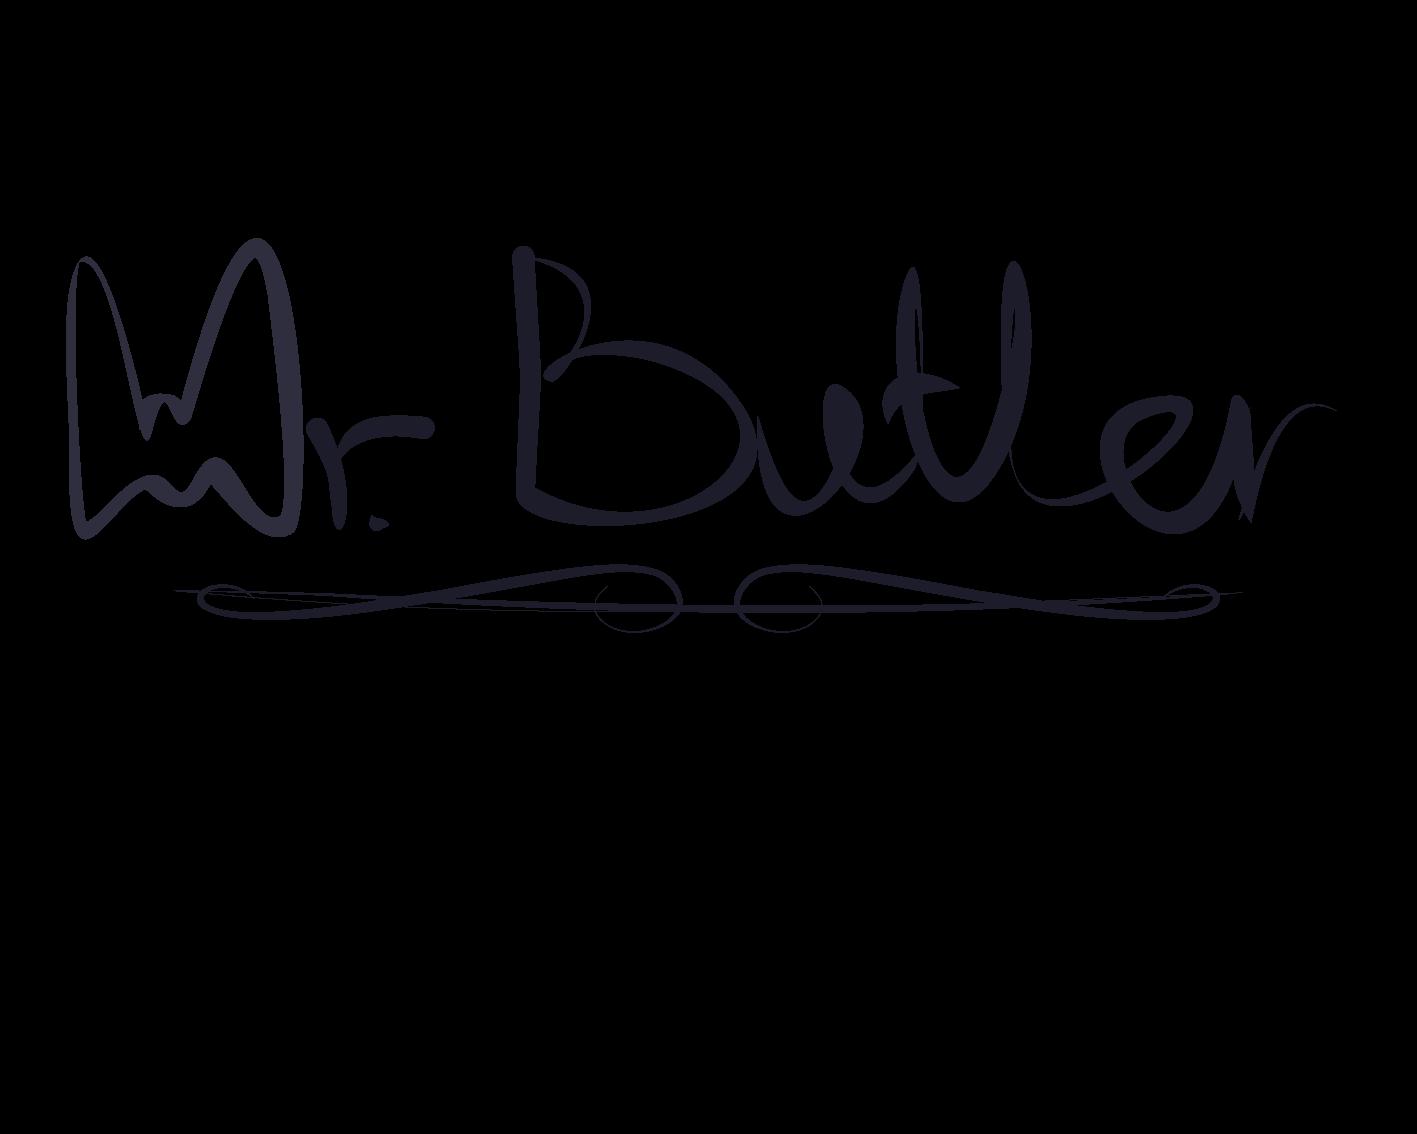 Фото Отрисовка логотипа 1